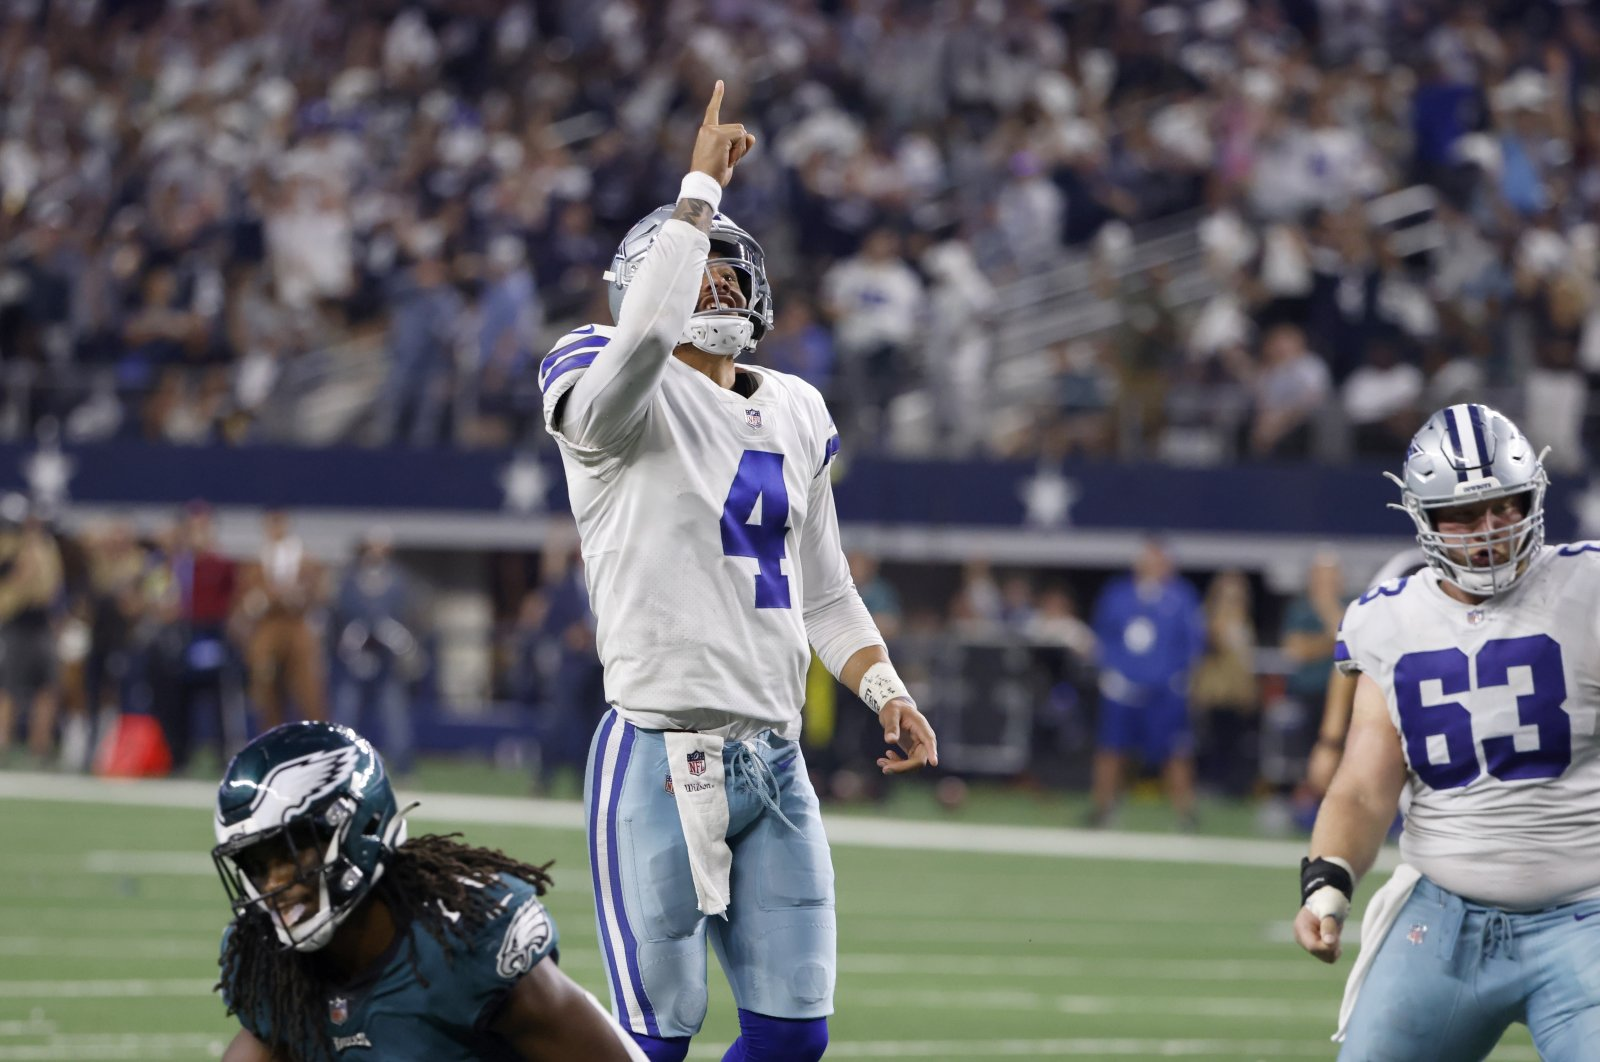 Dallas Cowboys quarterback Dak Prescott (4) and center Tyler Biadasz (63) celebrate a touchdown scored by Dalton Schultz in the second half of an NFL football game against the Philadelphia Eagles in Arlington, Texas, U.S., Monday, Sept. 27, 2021. (AP Photo)